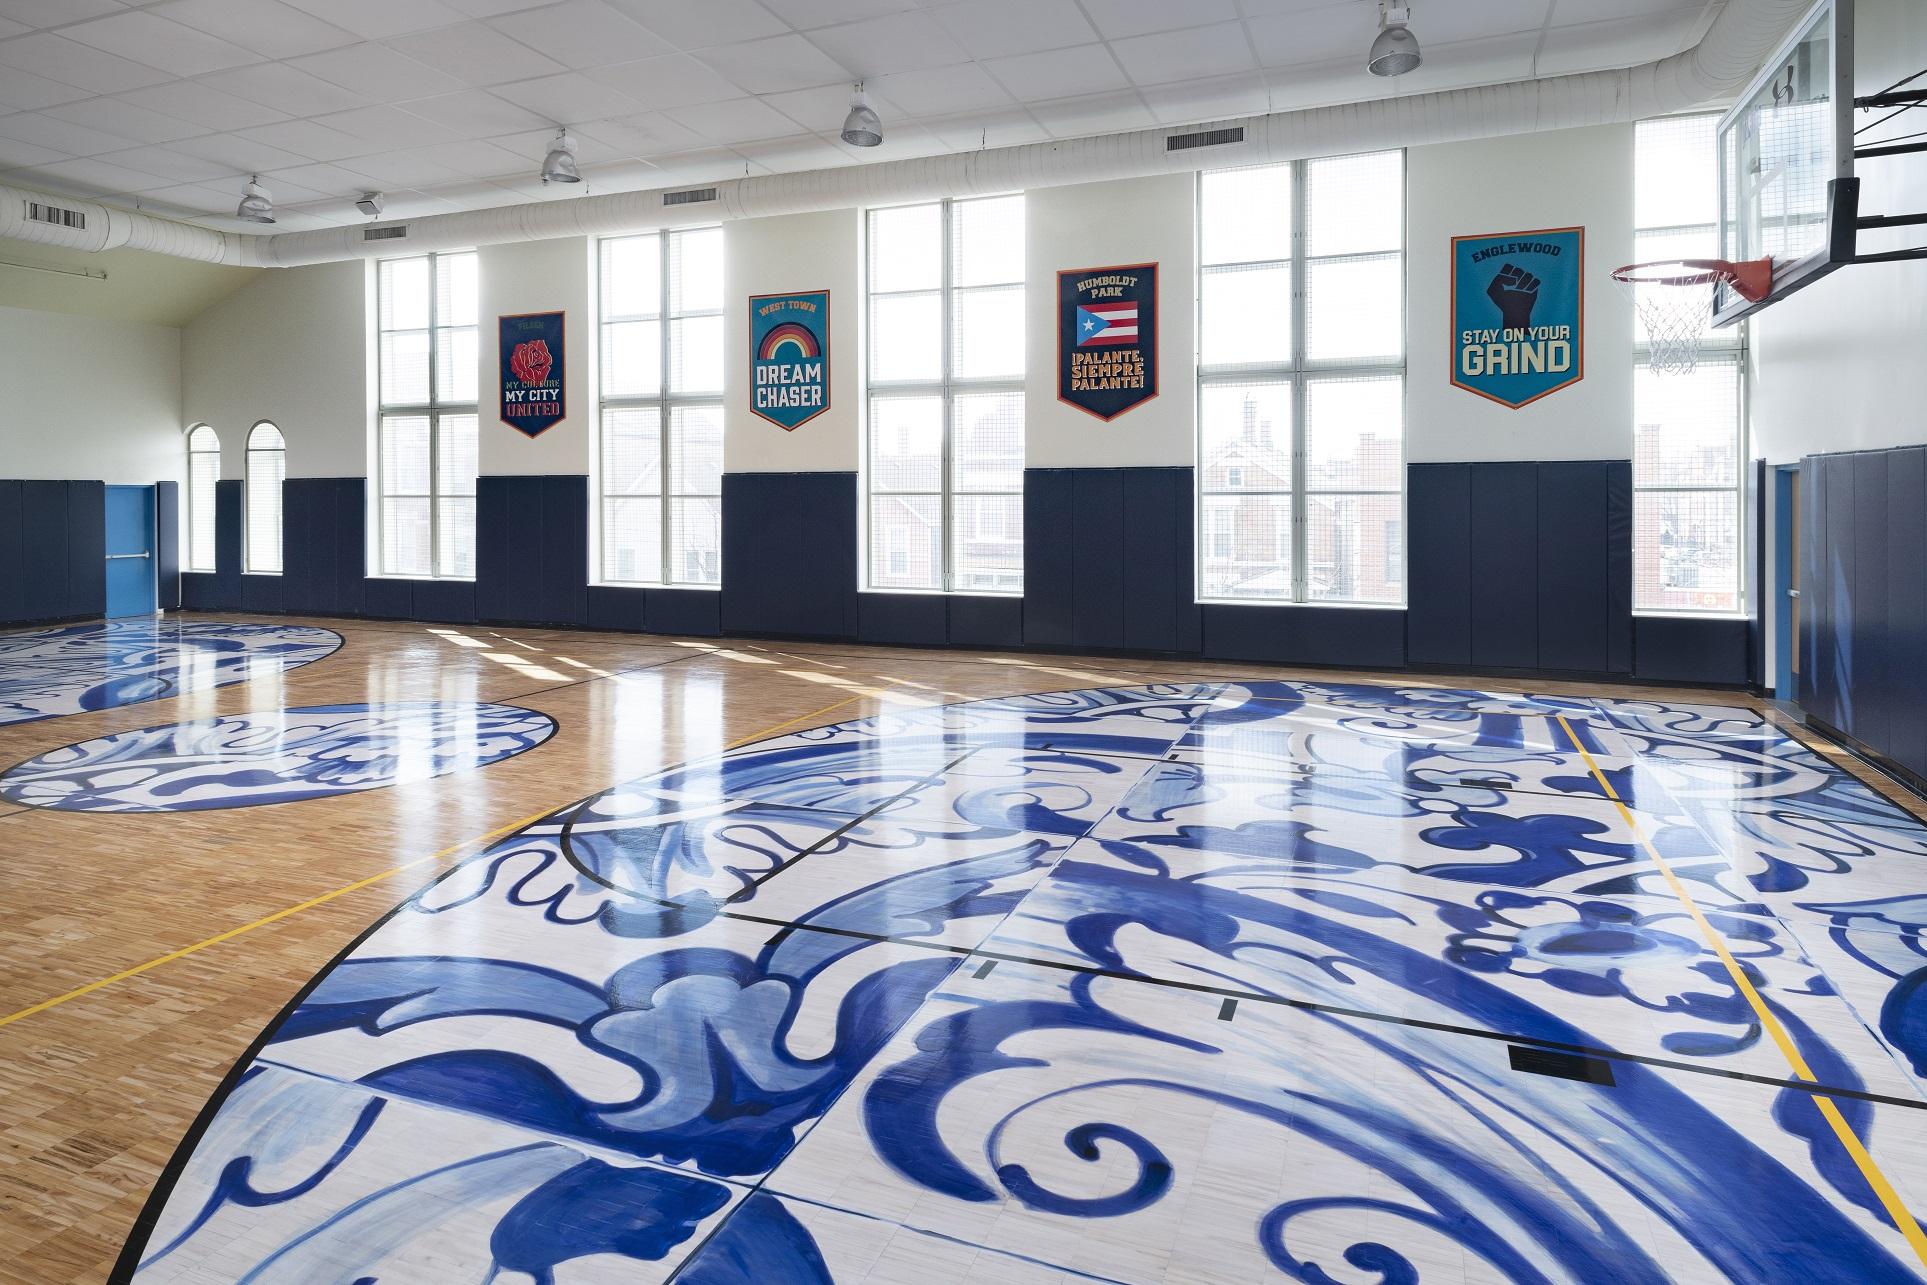 Union League Boys and Girls Club: Club One – Basketball Gym Renovation.